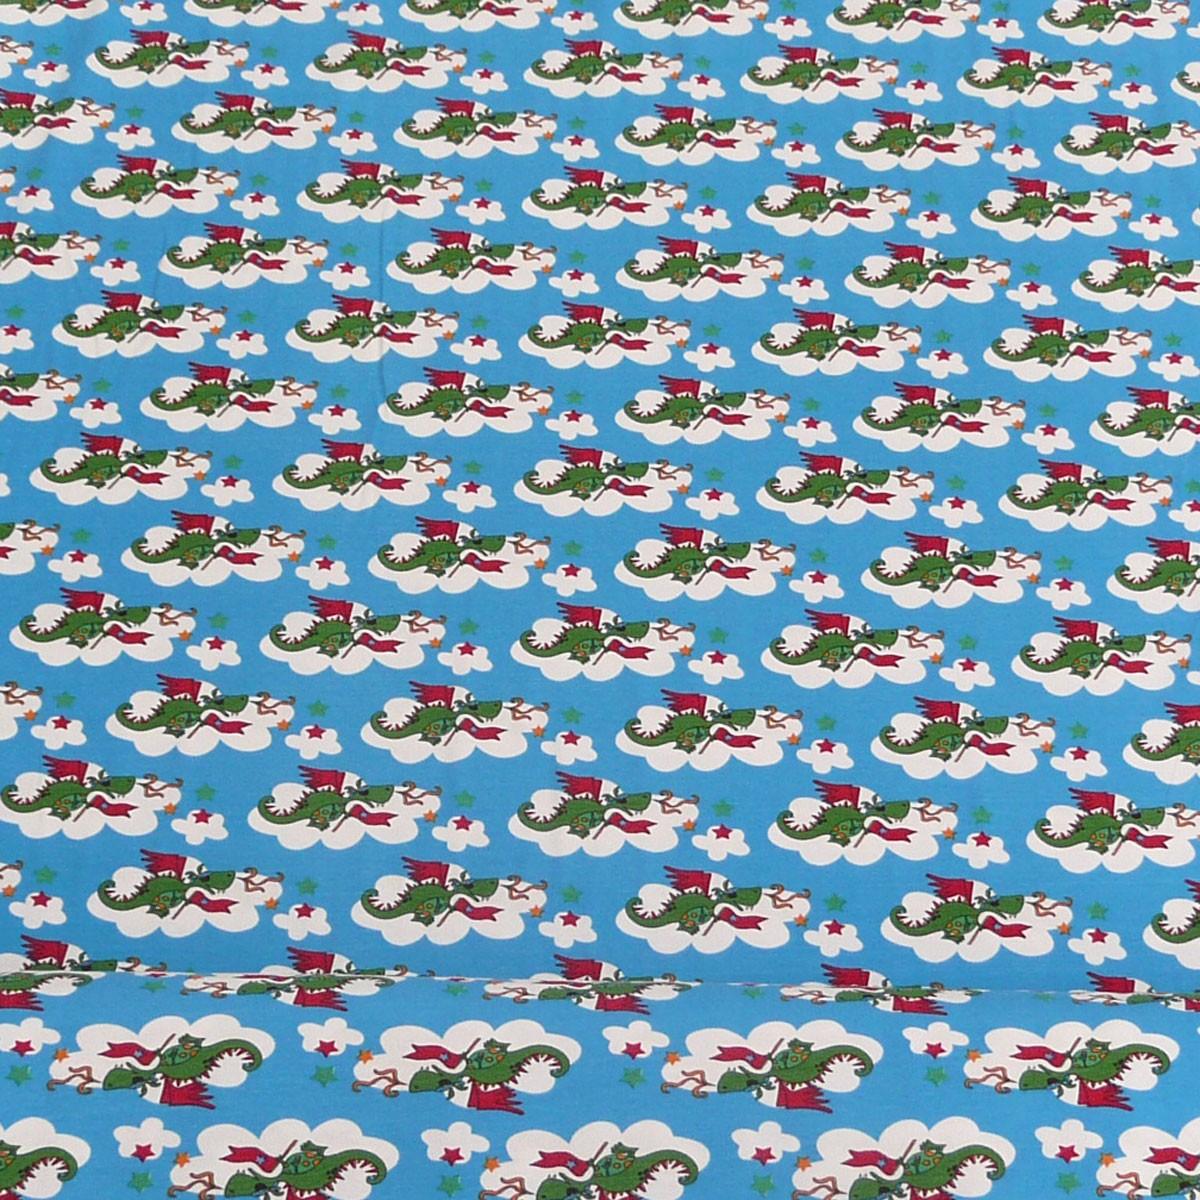 janeas world jersey kinder stoff fliegende drachen blau stoffe stoffe gemustert kinderstoffe. Black Bedroom Furniture Sets. Home Design Ideas